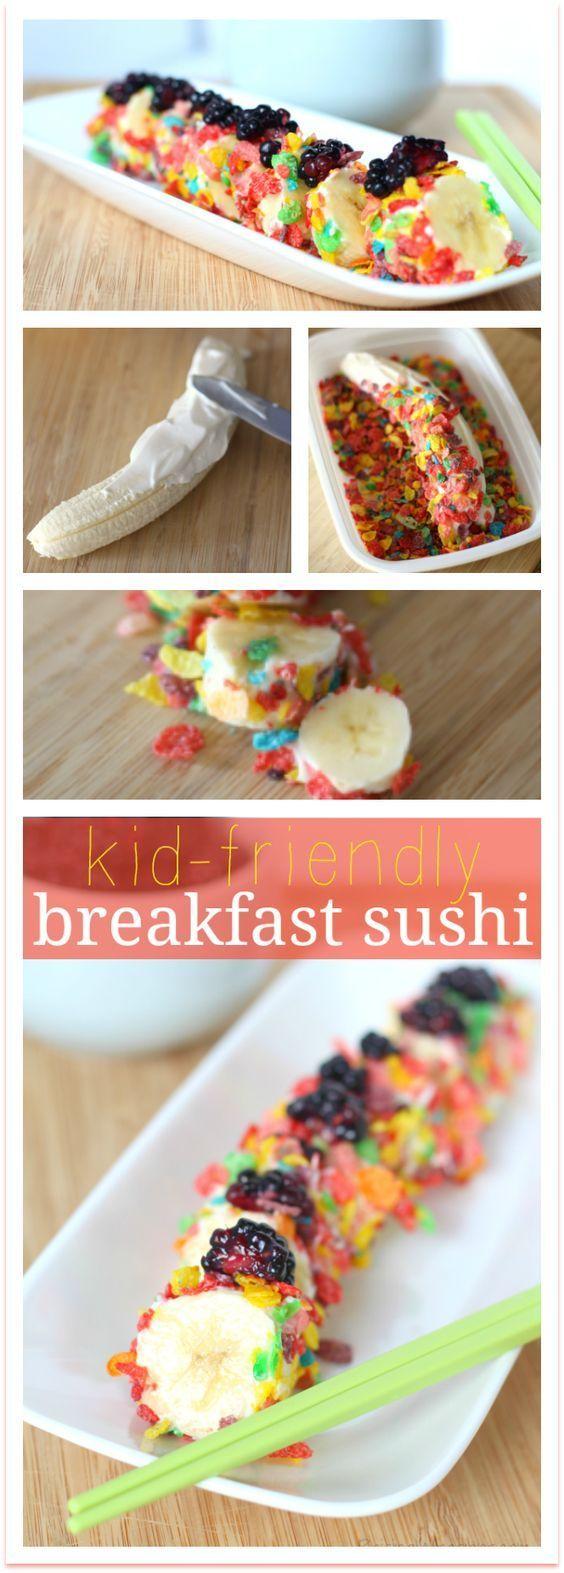 Kids Breakfast Sushi Recipe | Easy & FUN breakfast idea for kids - a perfect kid-friendly back-to-school breakfast too! #PebblesCereal #ad